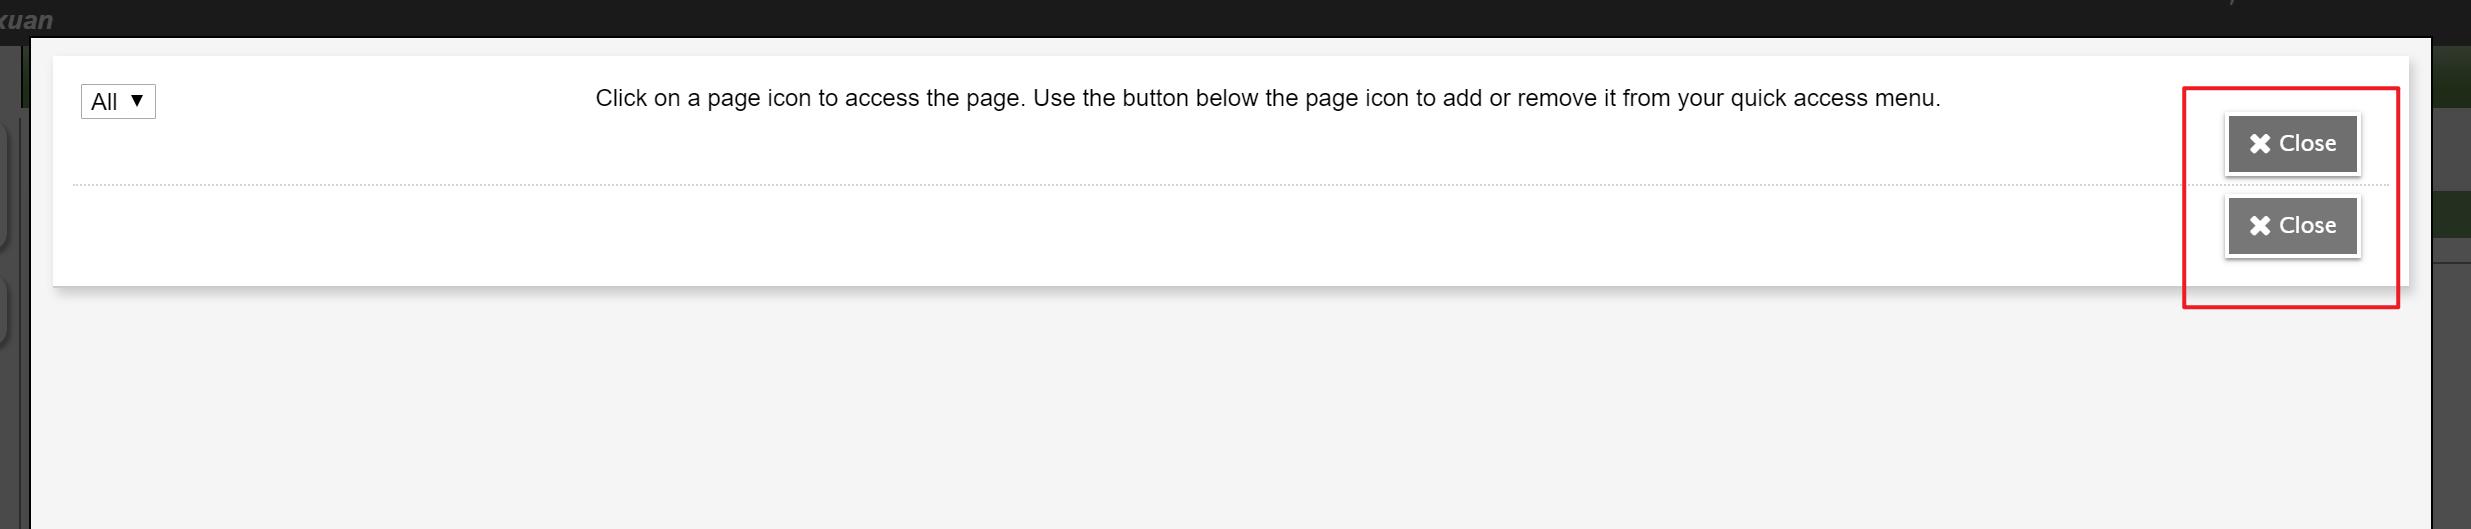 Redundant close button